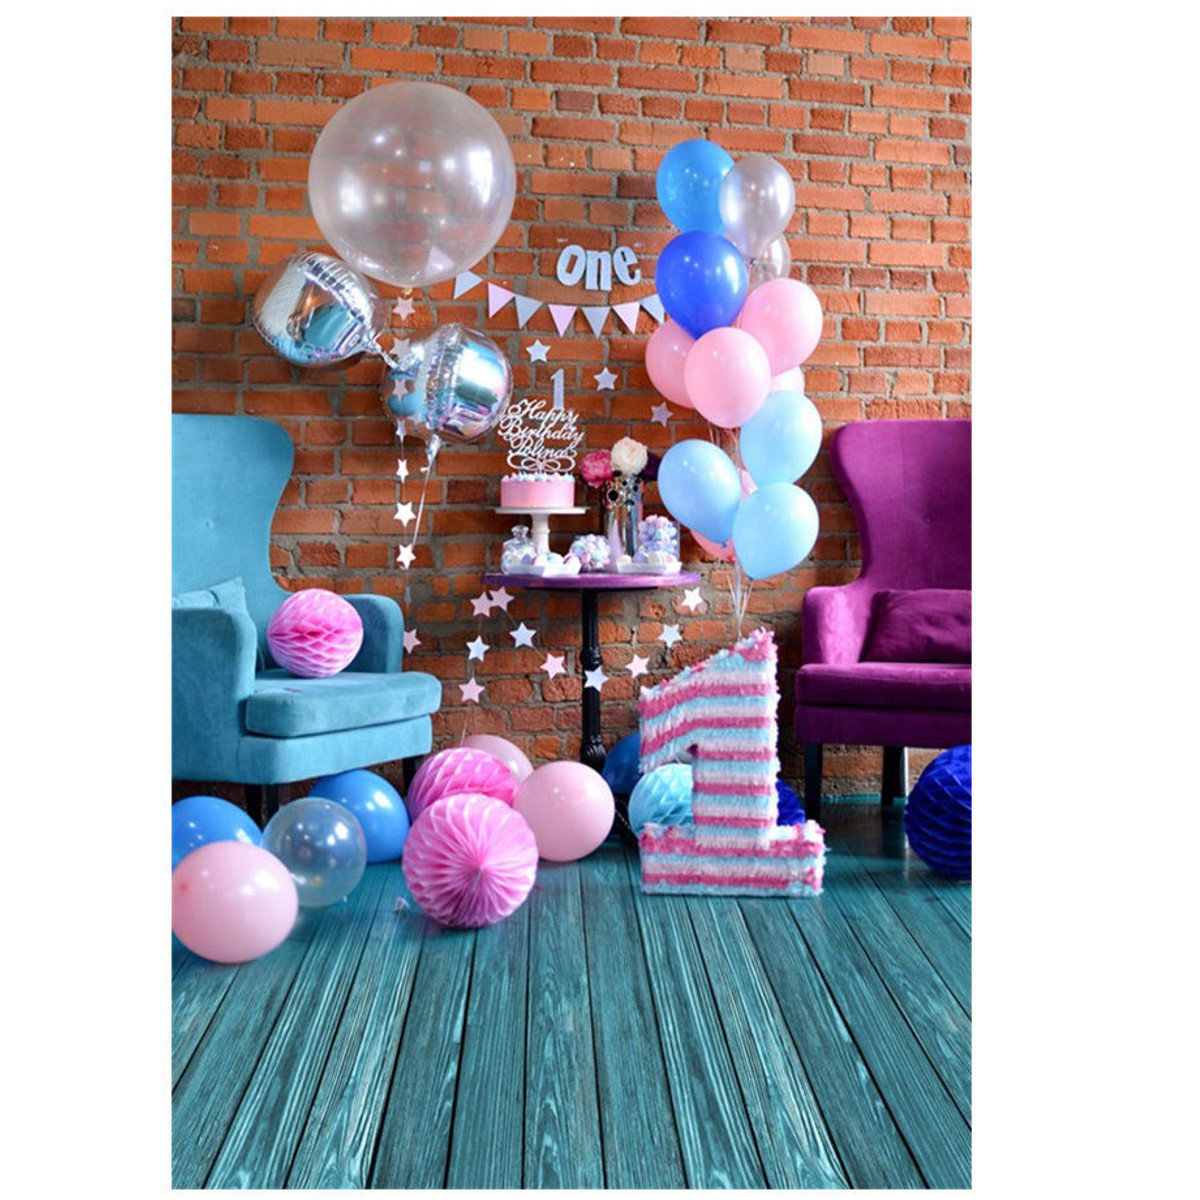 5x7ftSweet Birthday Scene Baby Photography Backgrounds Vinyl Photo Backdrops